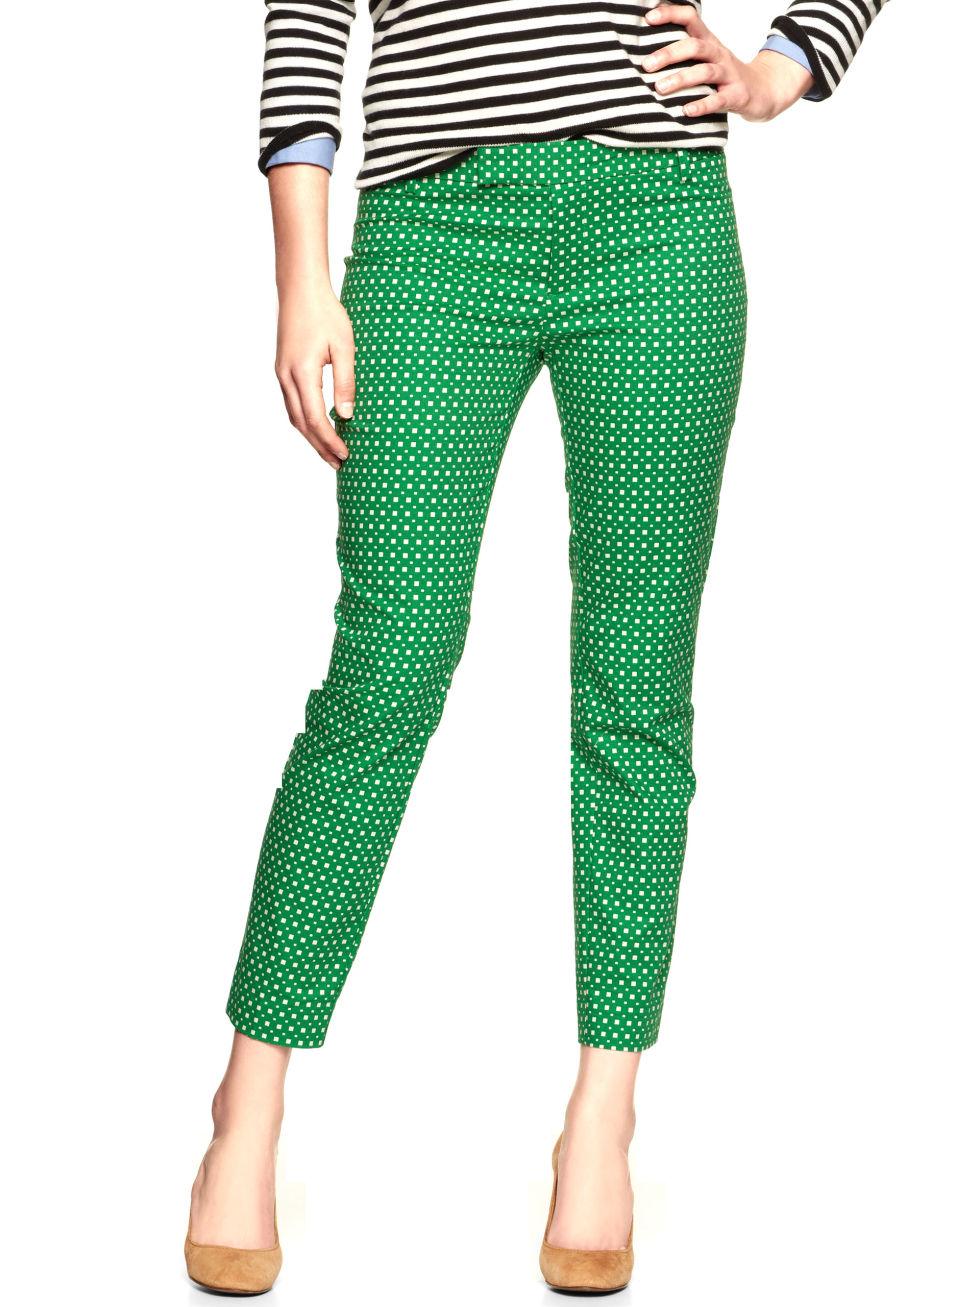 Printed Pants for Women - Spring Print Pants Trend